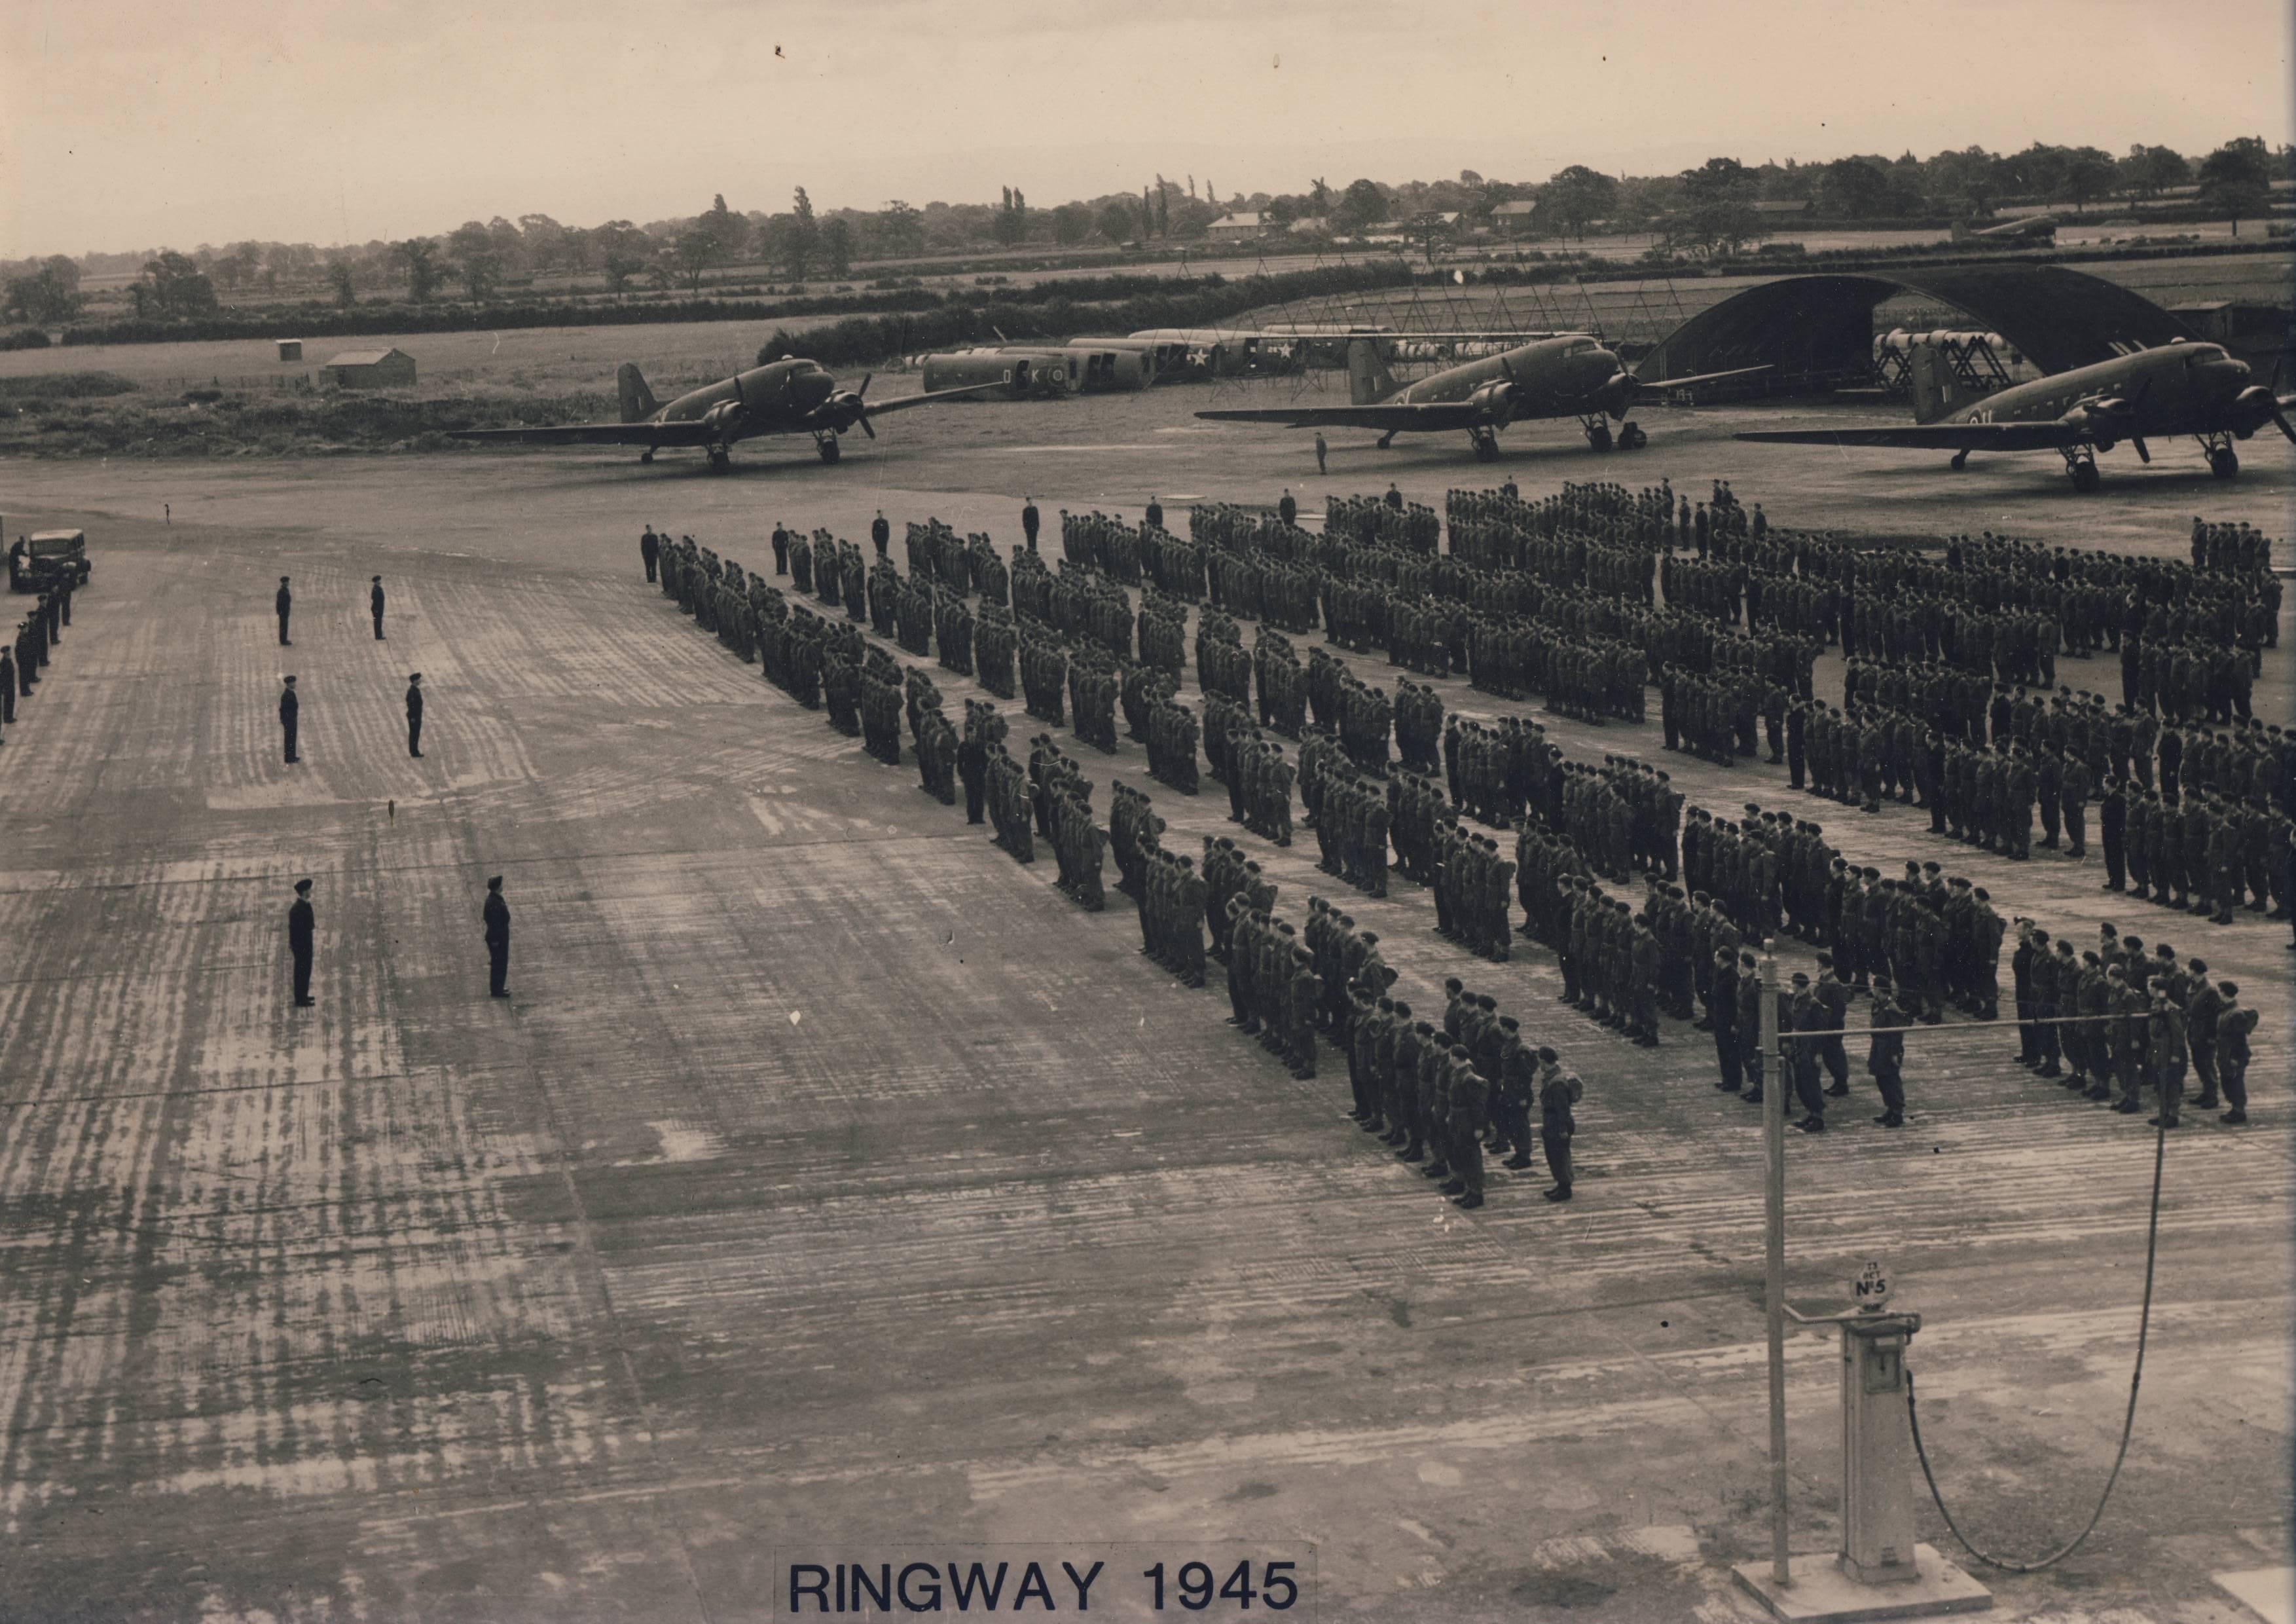 RINGWAY 1945 copy